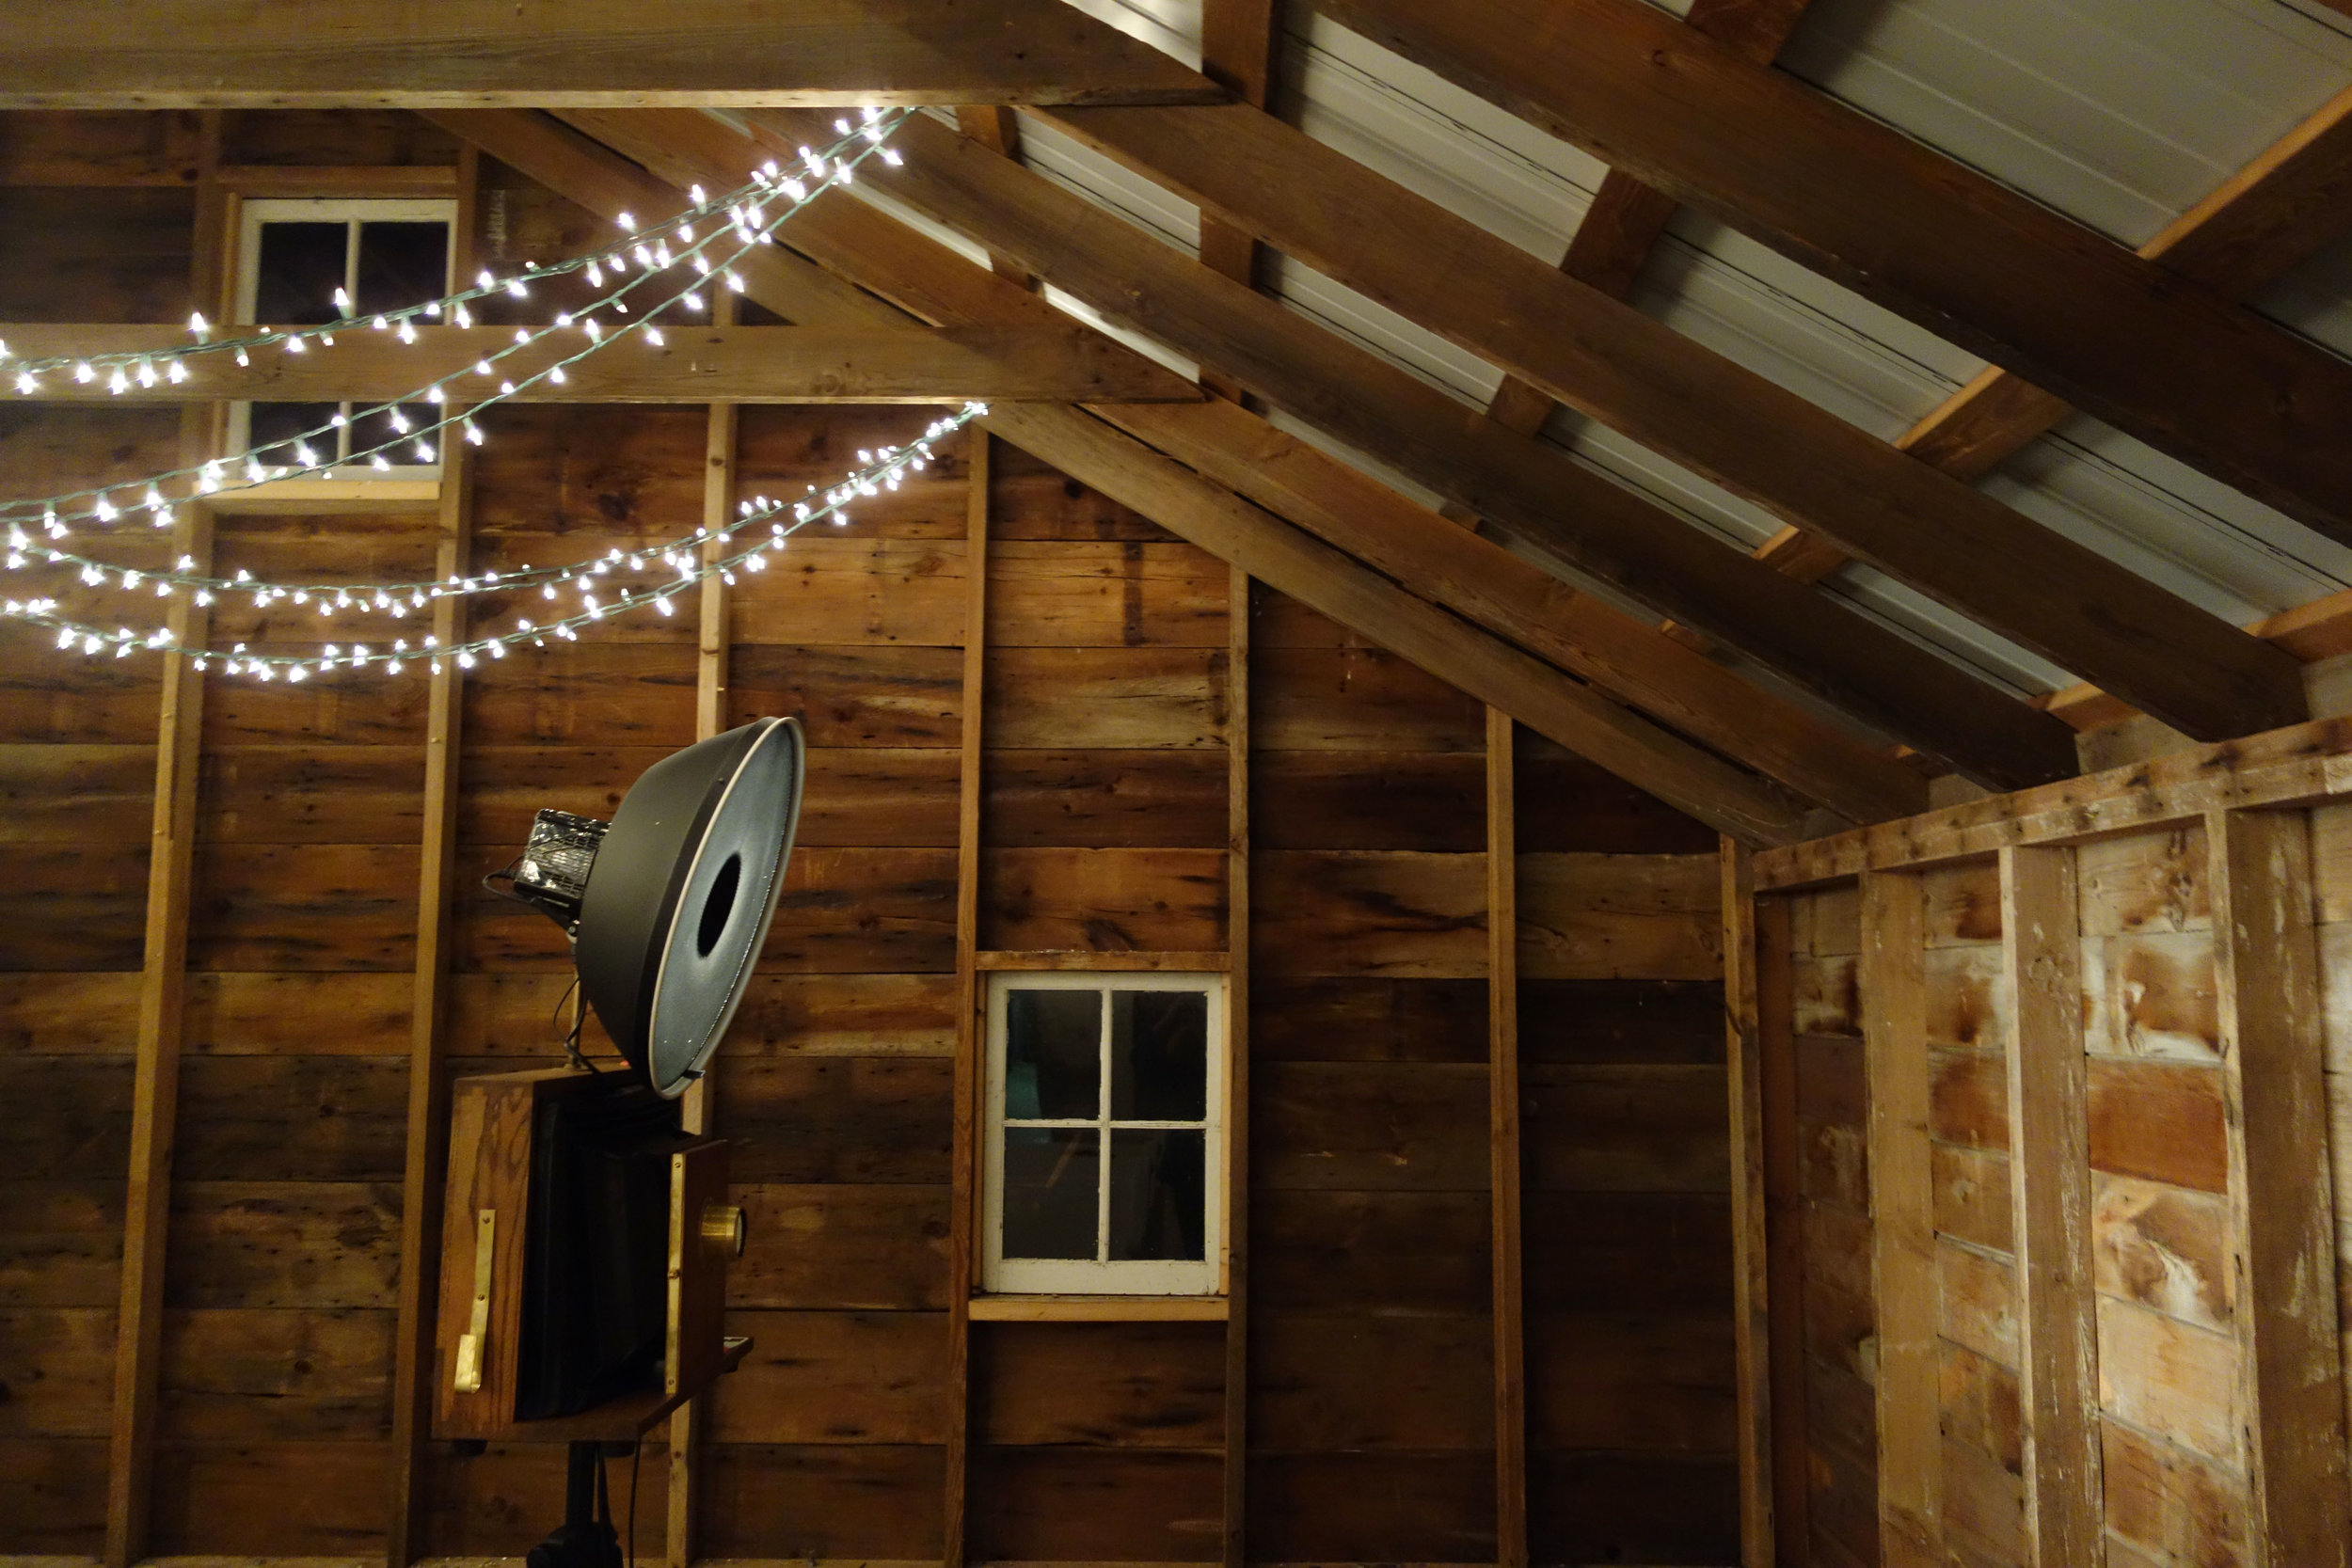 Fotio in the barn!